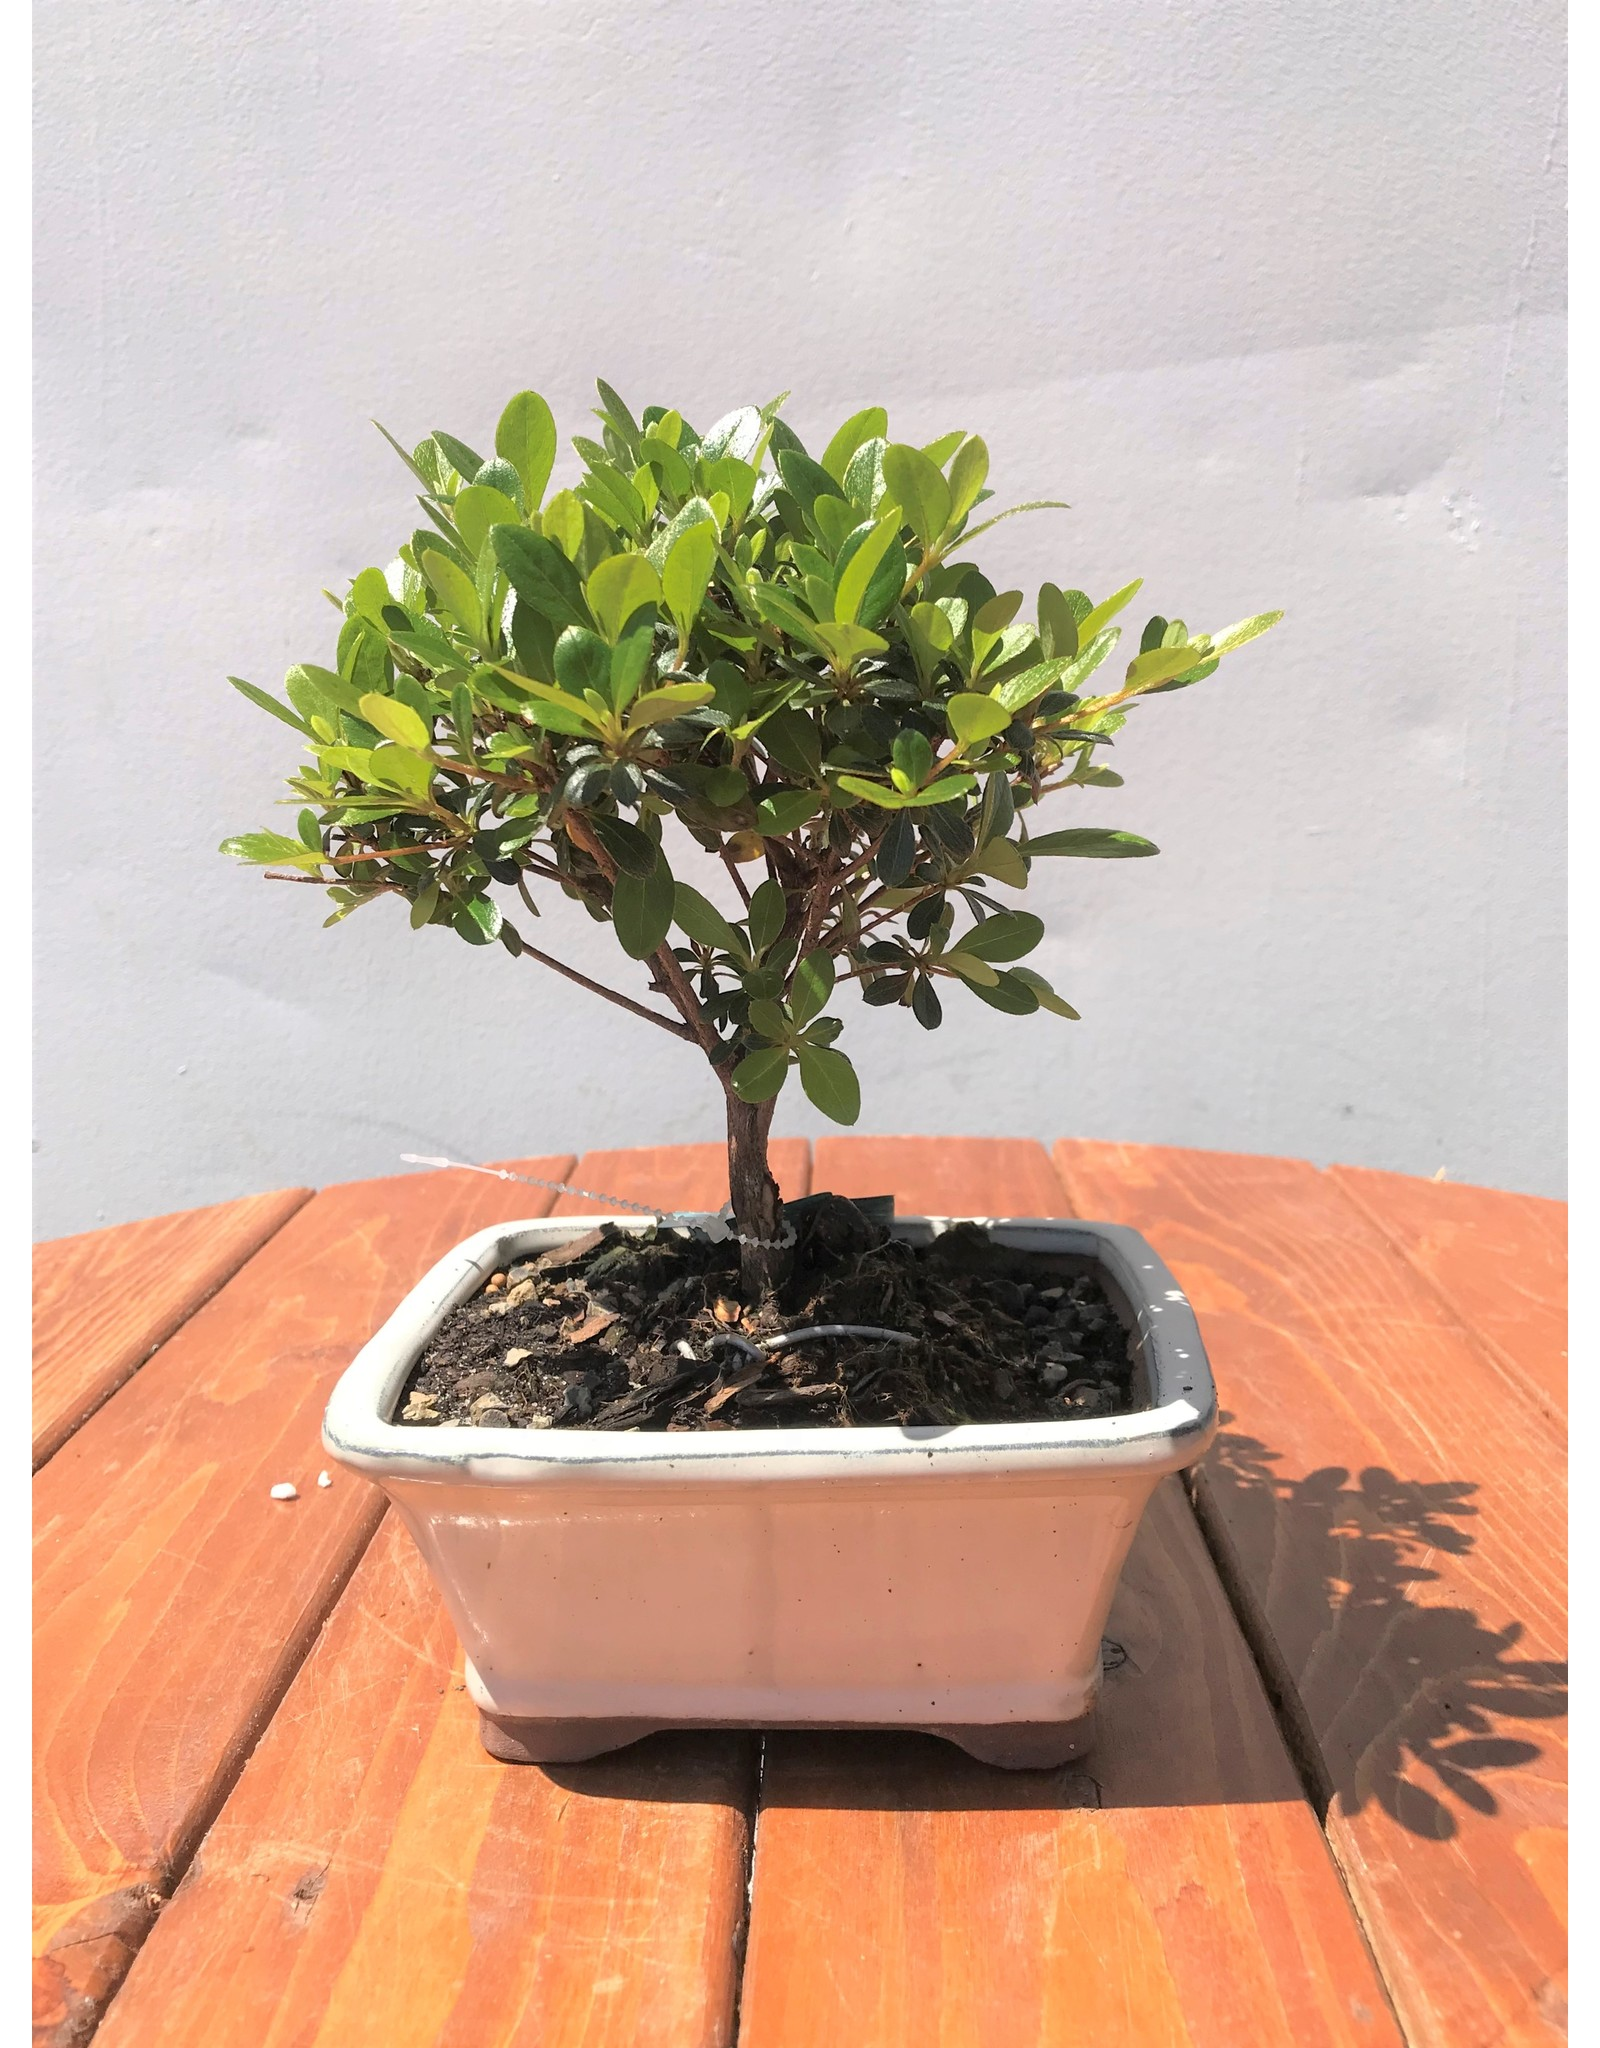 Bonsai, Satsuki Azalea - Rhododendron Indicum - Small